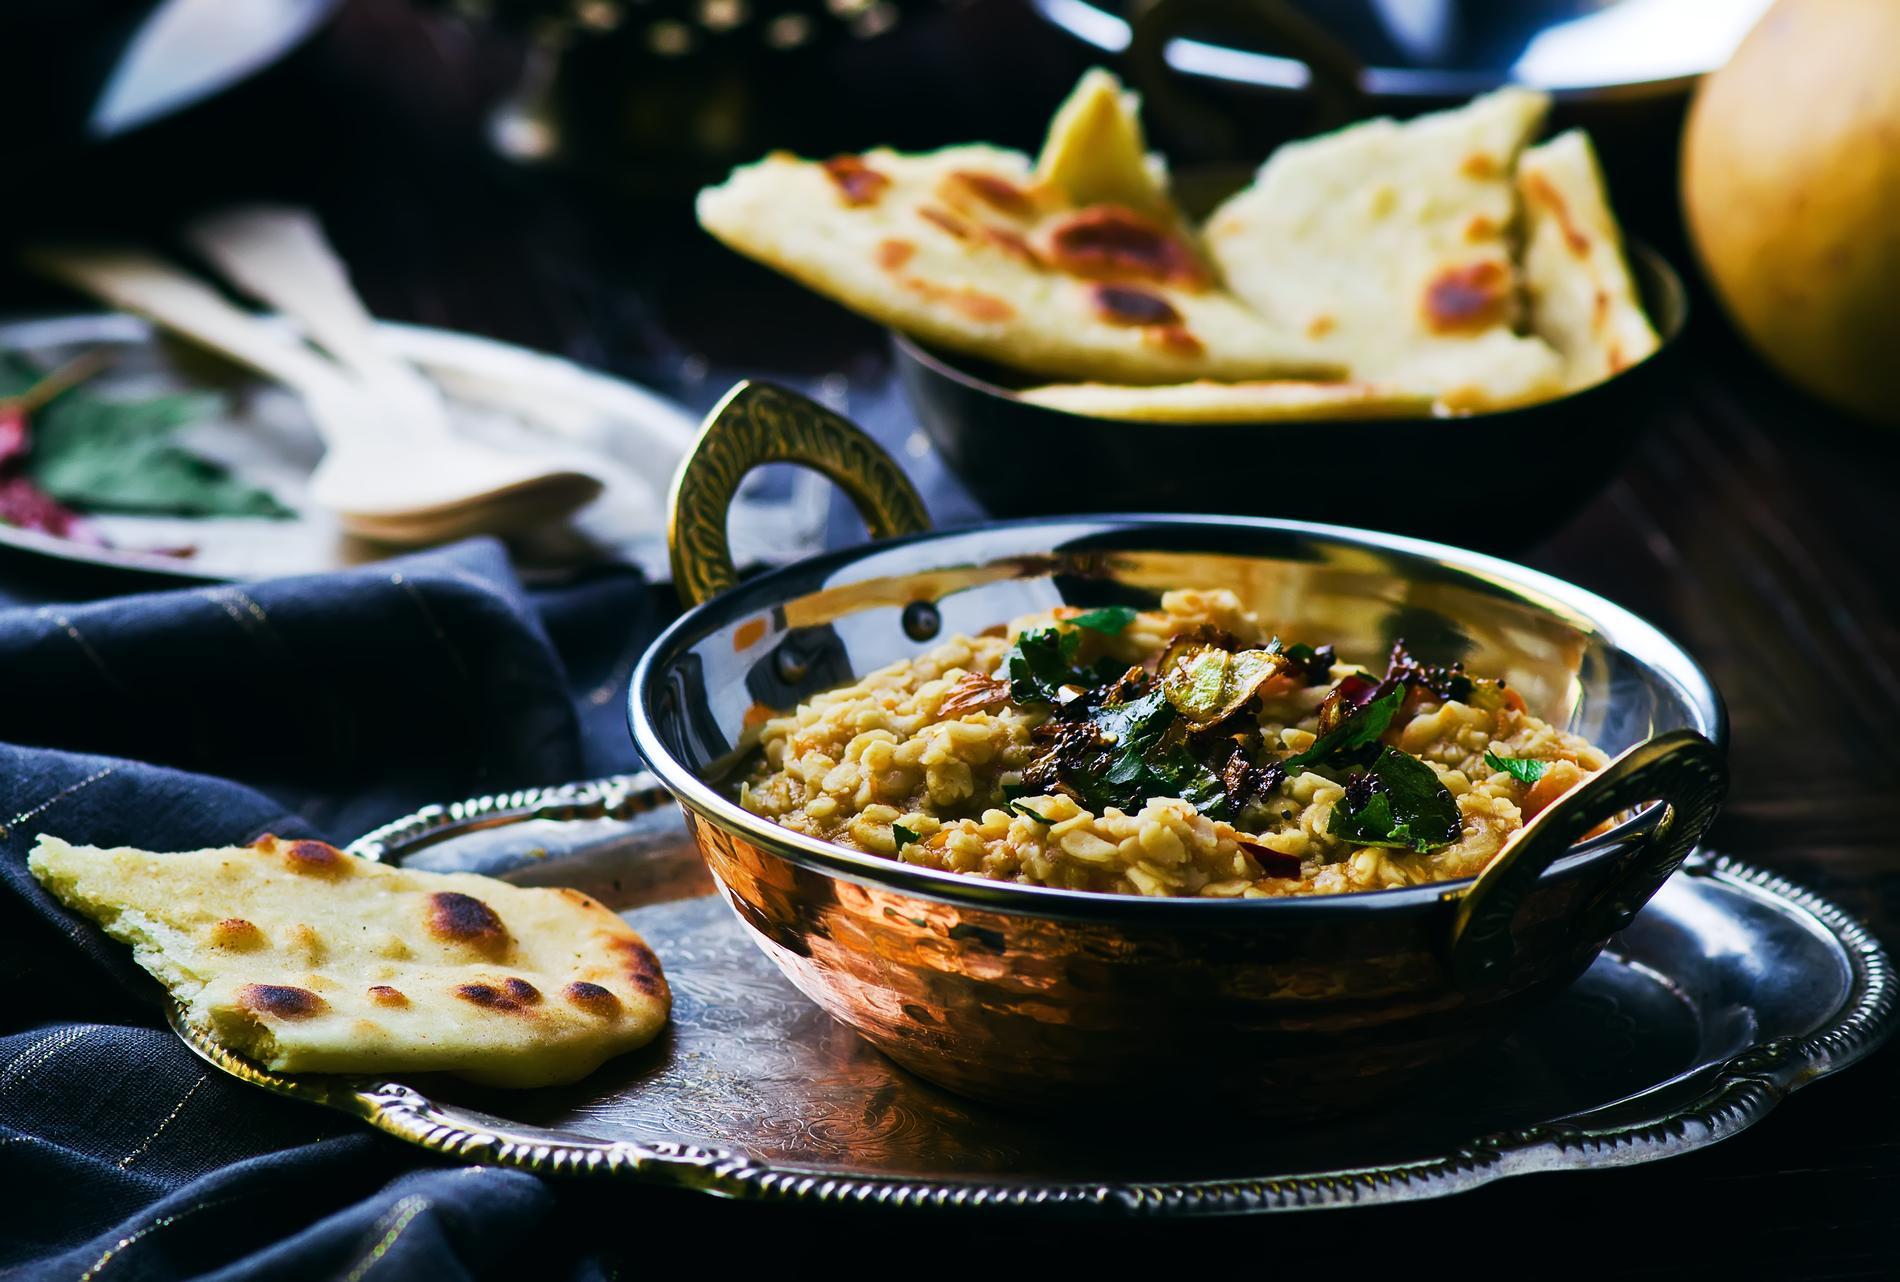 recettes cuisine indienne recettes faciles et rapides cuisine madame figaro. Black Bedroom Furniture Sets. Home Design Ideas